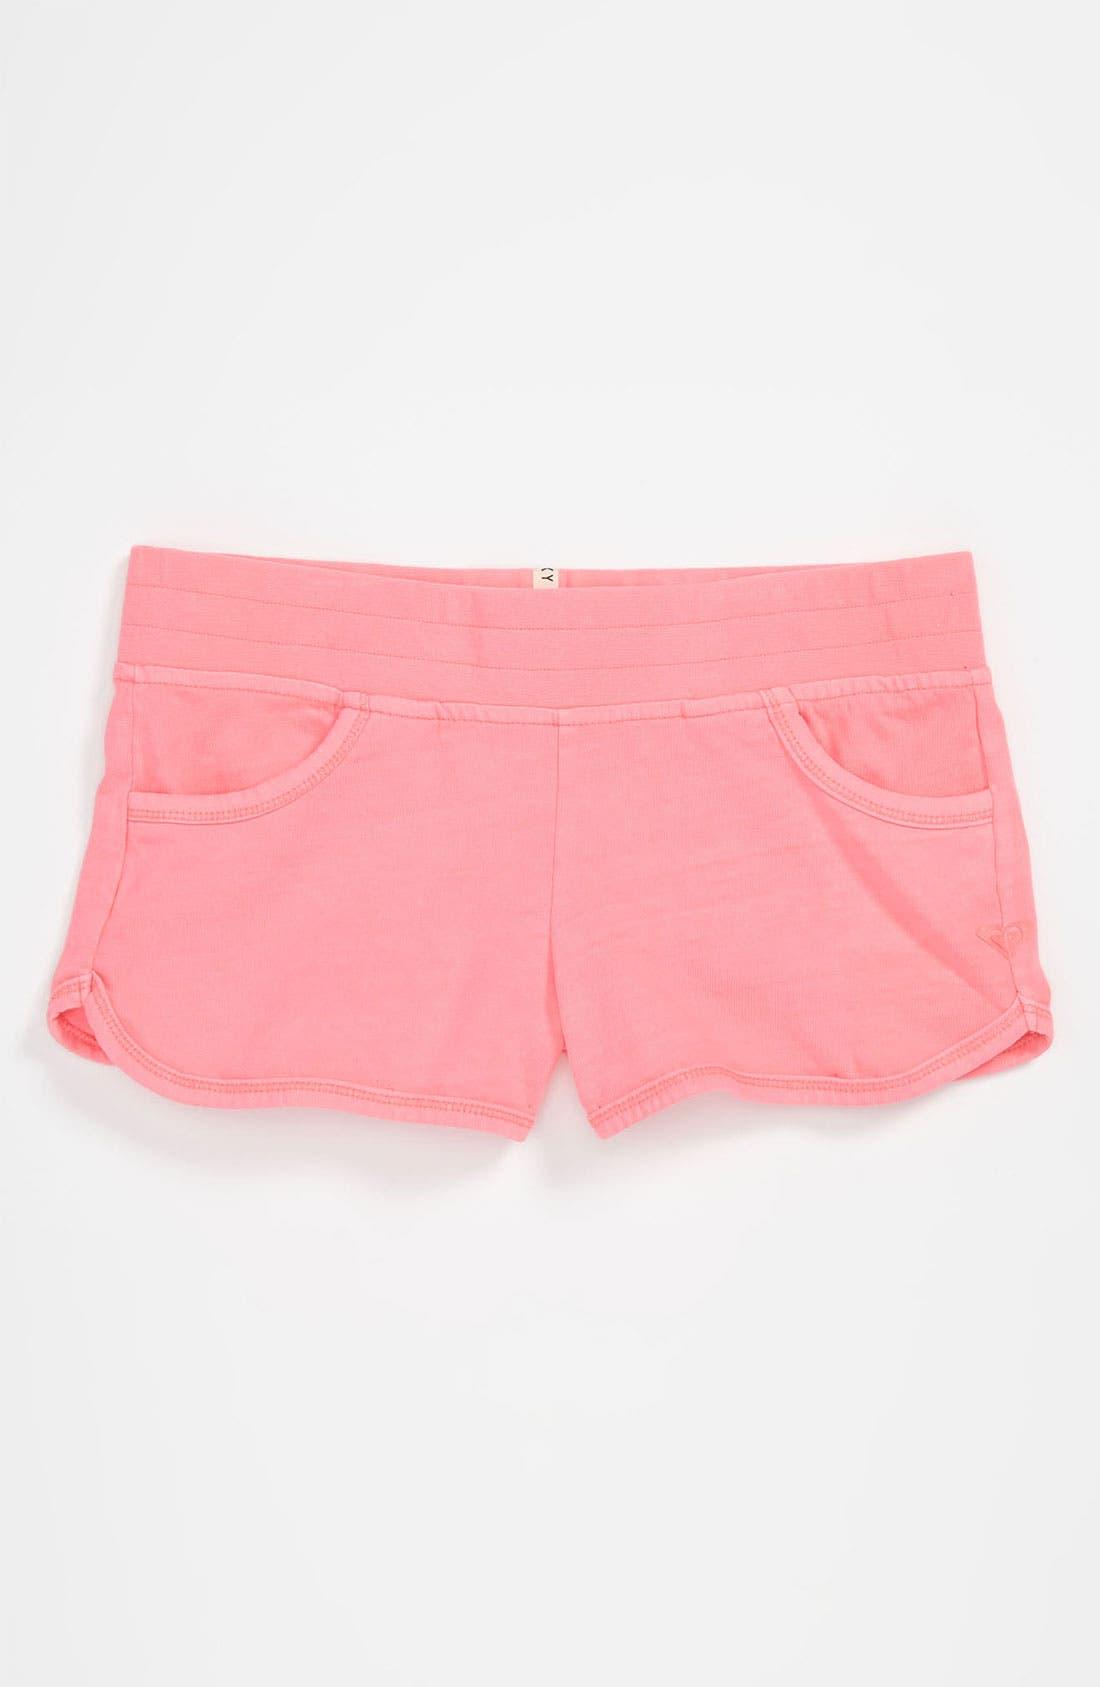 Alternate Image 1 Selected - 'Tidal Wave' Shorts (Big Girls)